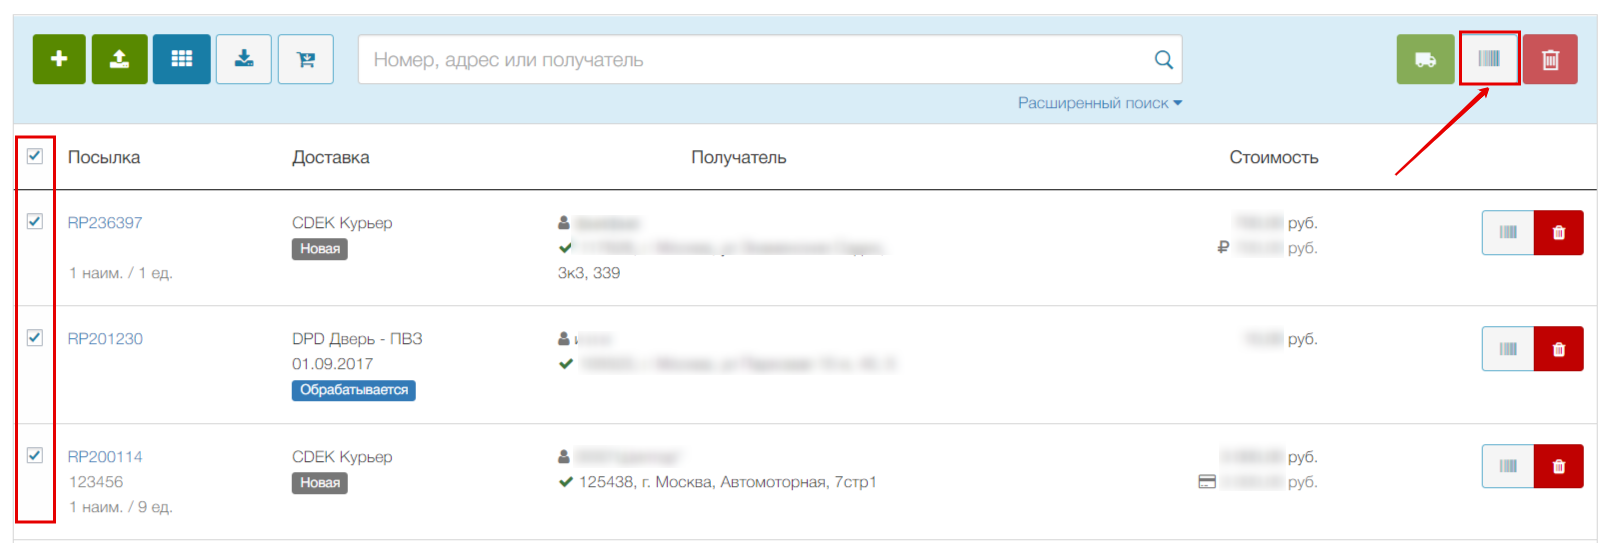 files.php?filename=9e6583835c5813e1e20b7